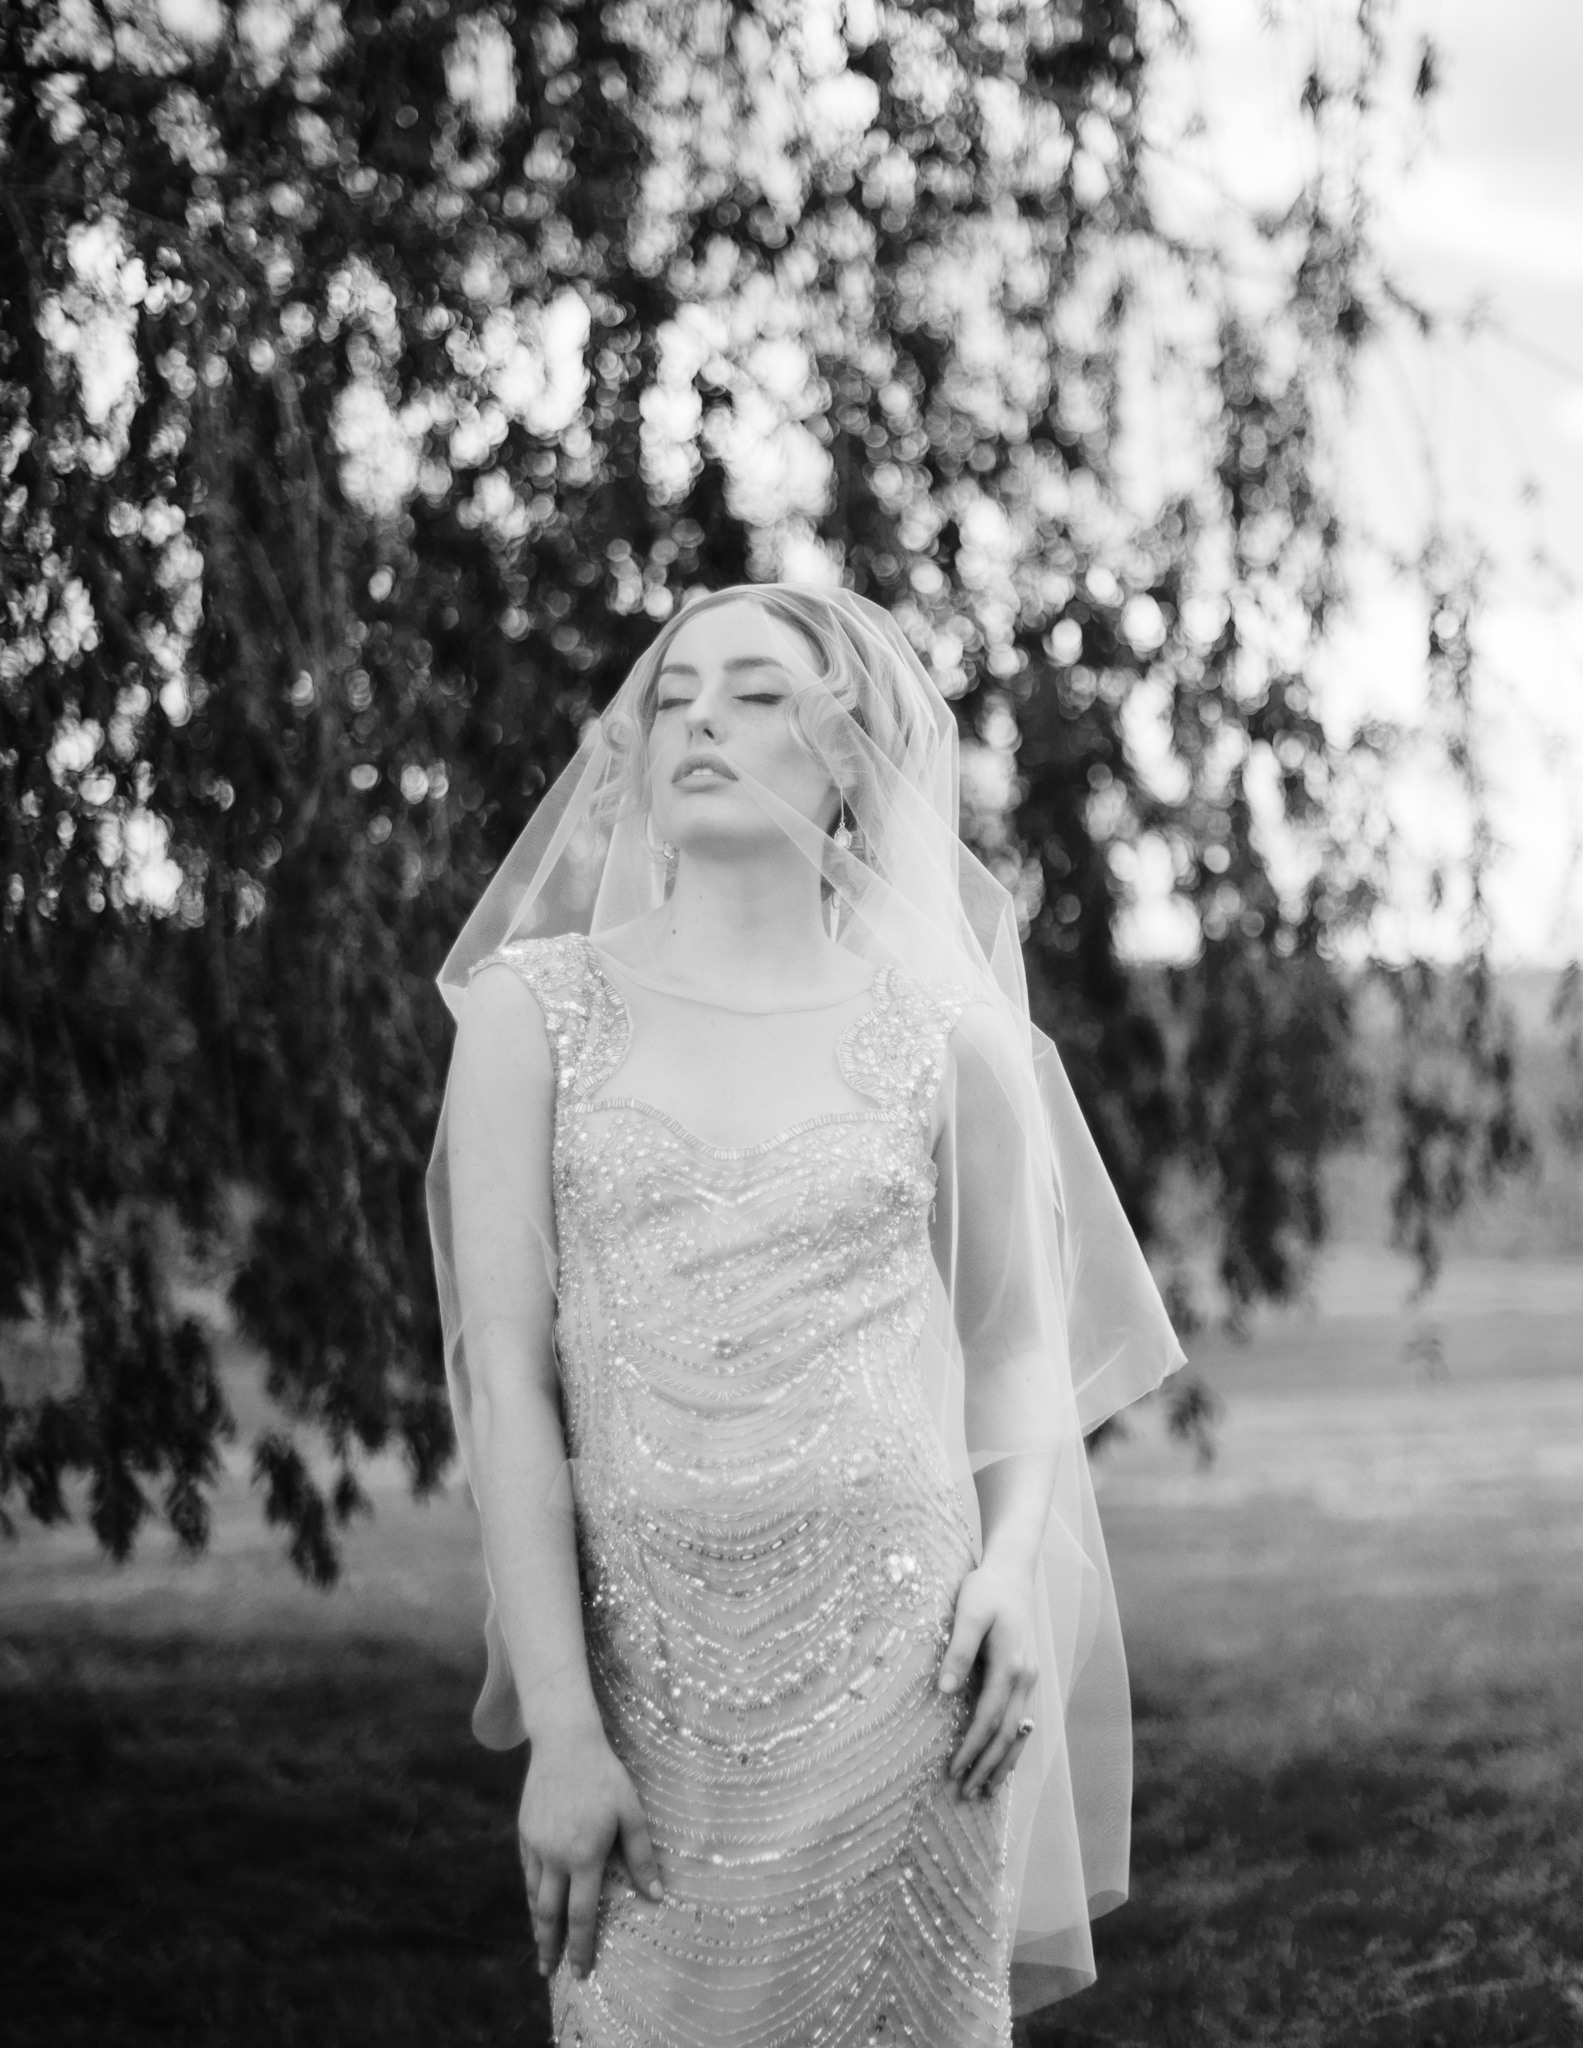 virginiawedding_bridalphotos_charlottesvillewedding_youseephotography_TrumpWinery (85).jpg